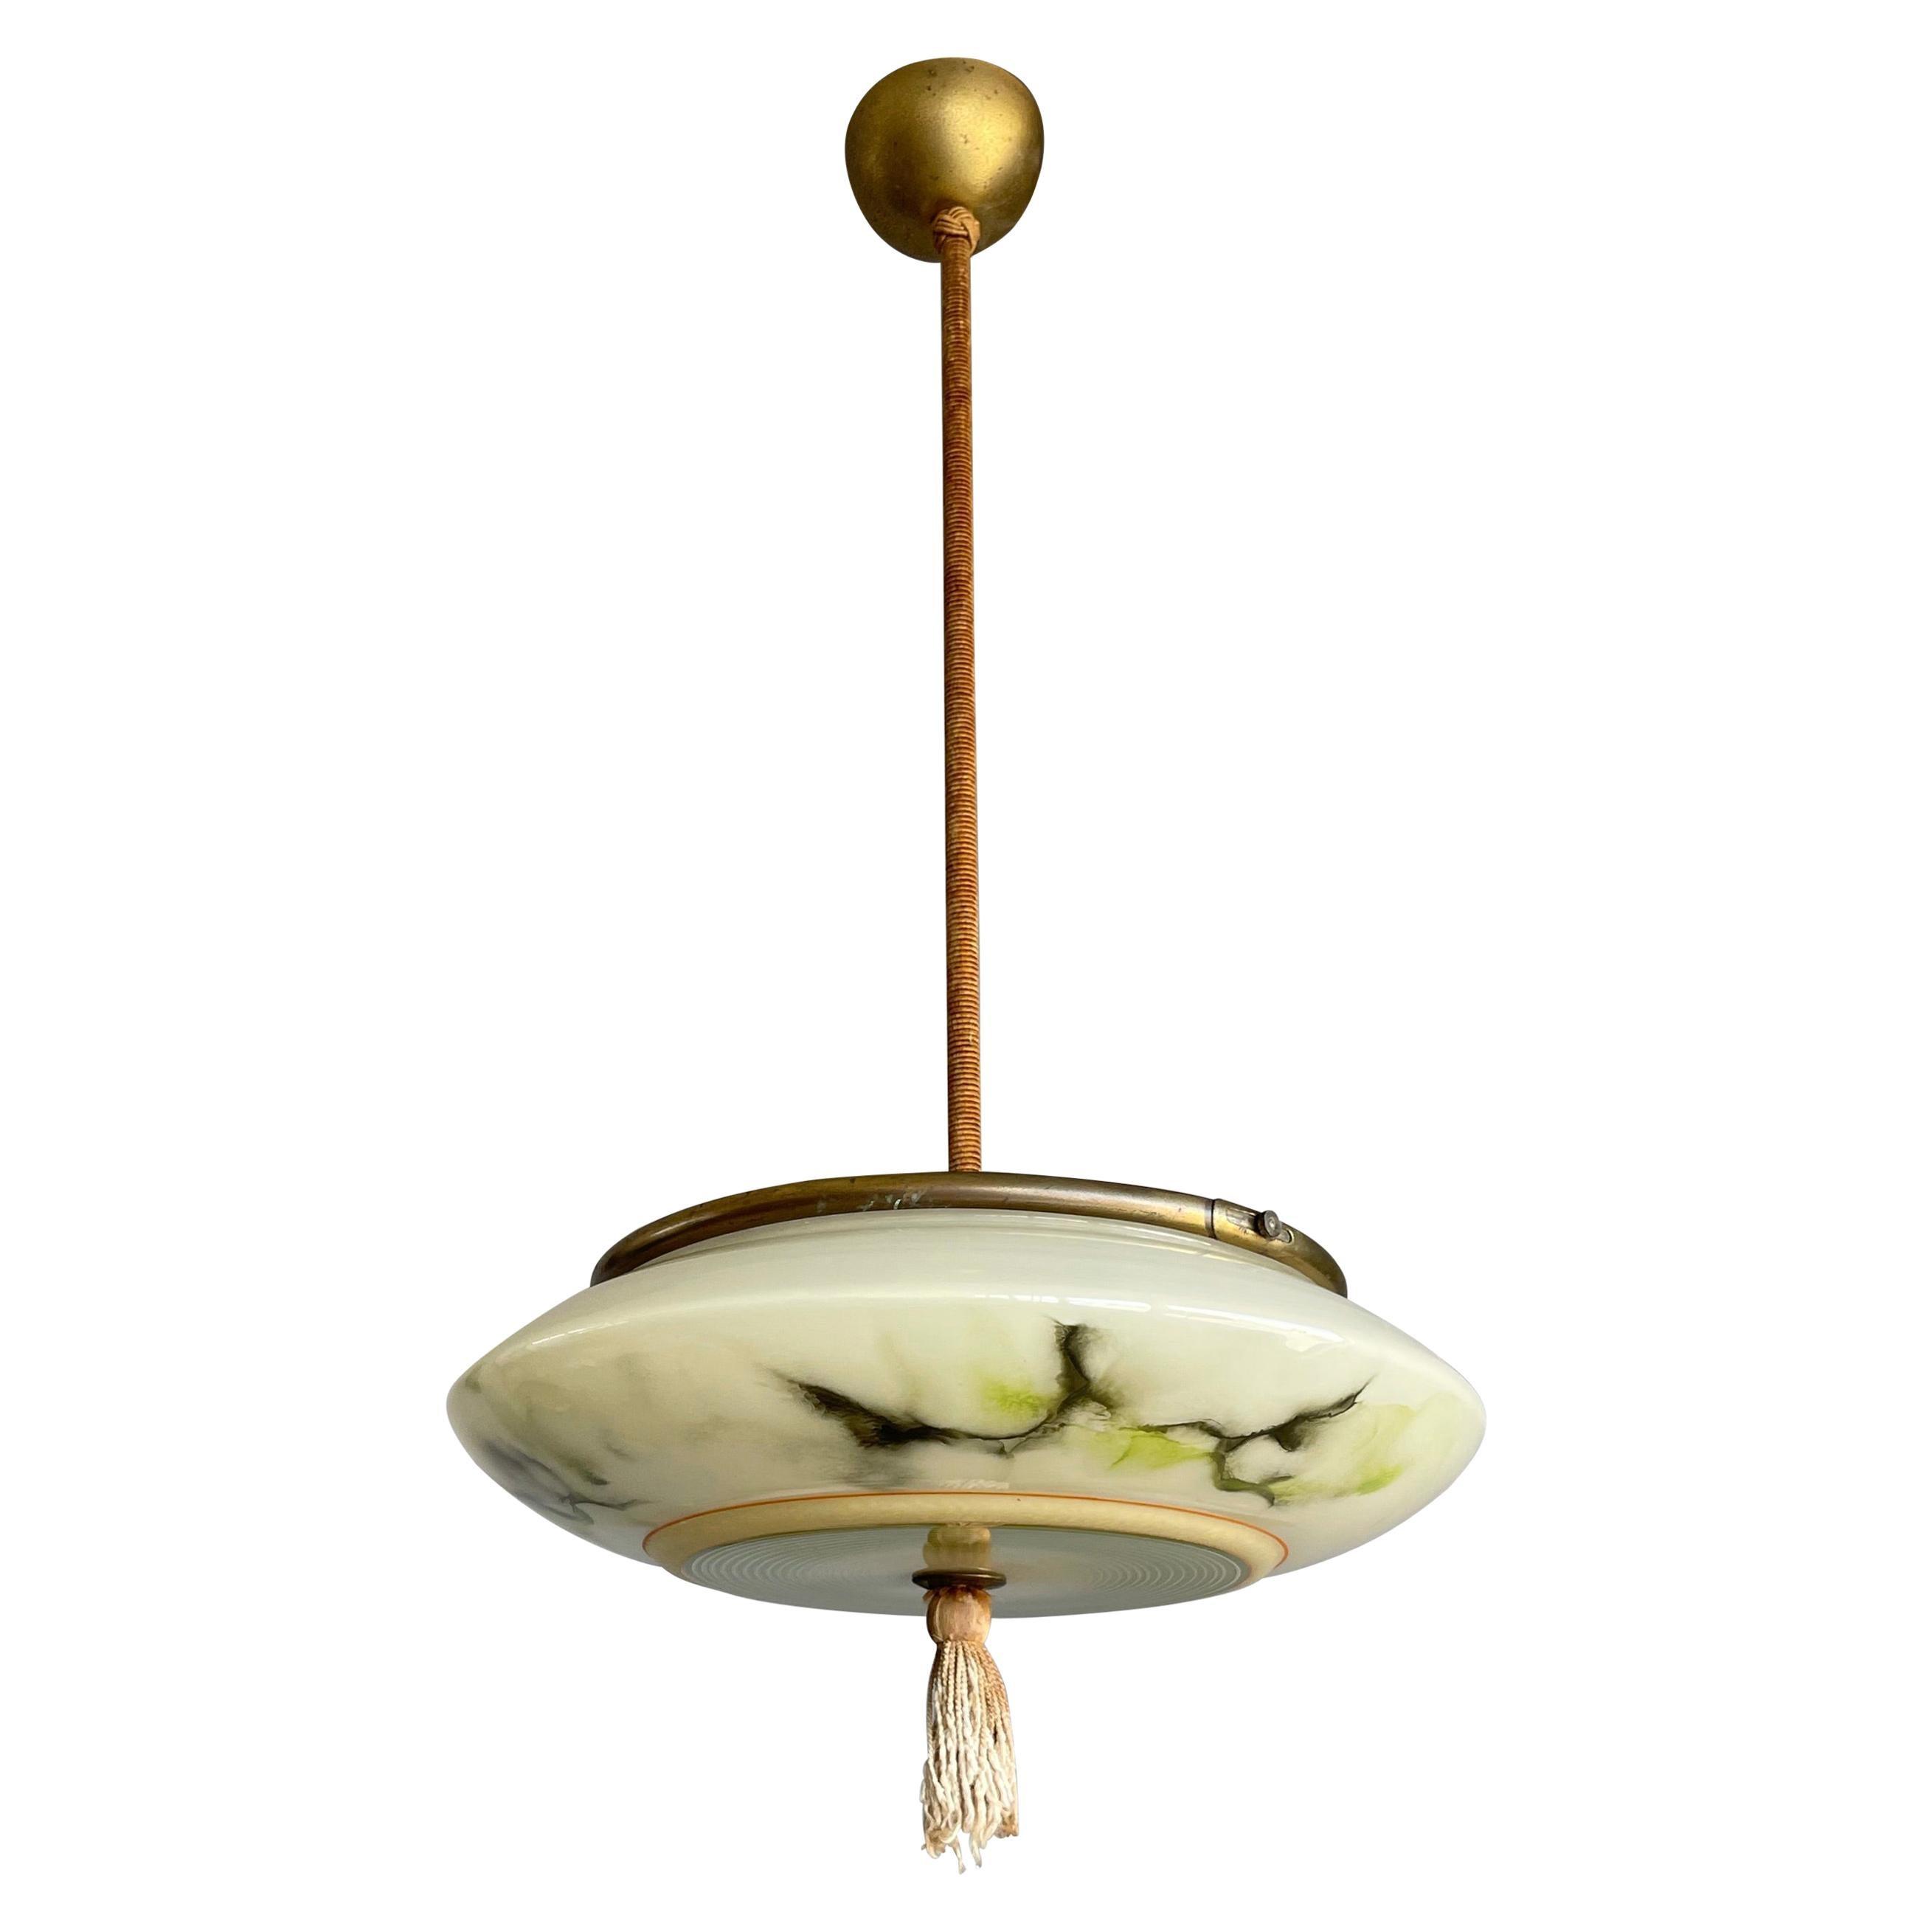 Art Deco Glass Pendant Light / Flush Mount w. Tassle & Transparent Glass Top